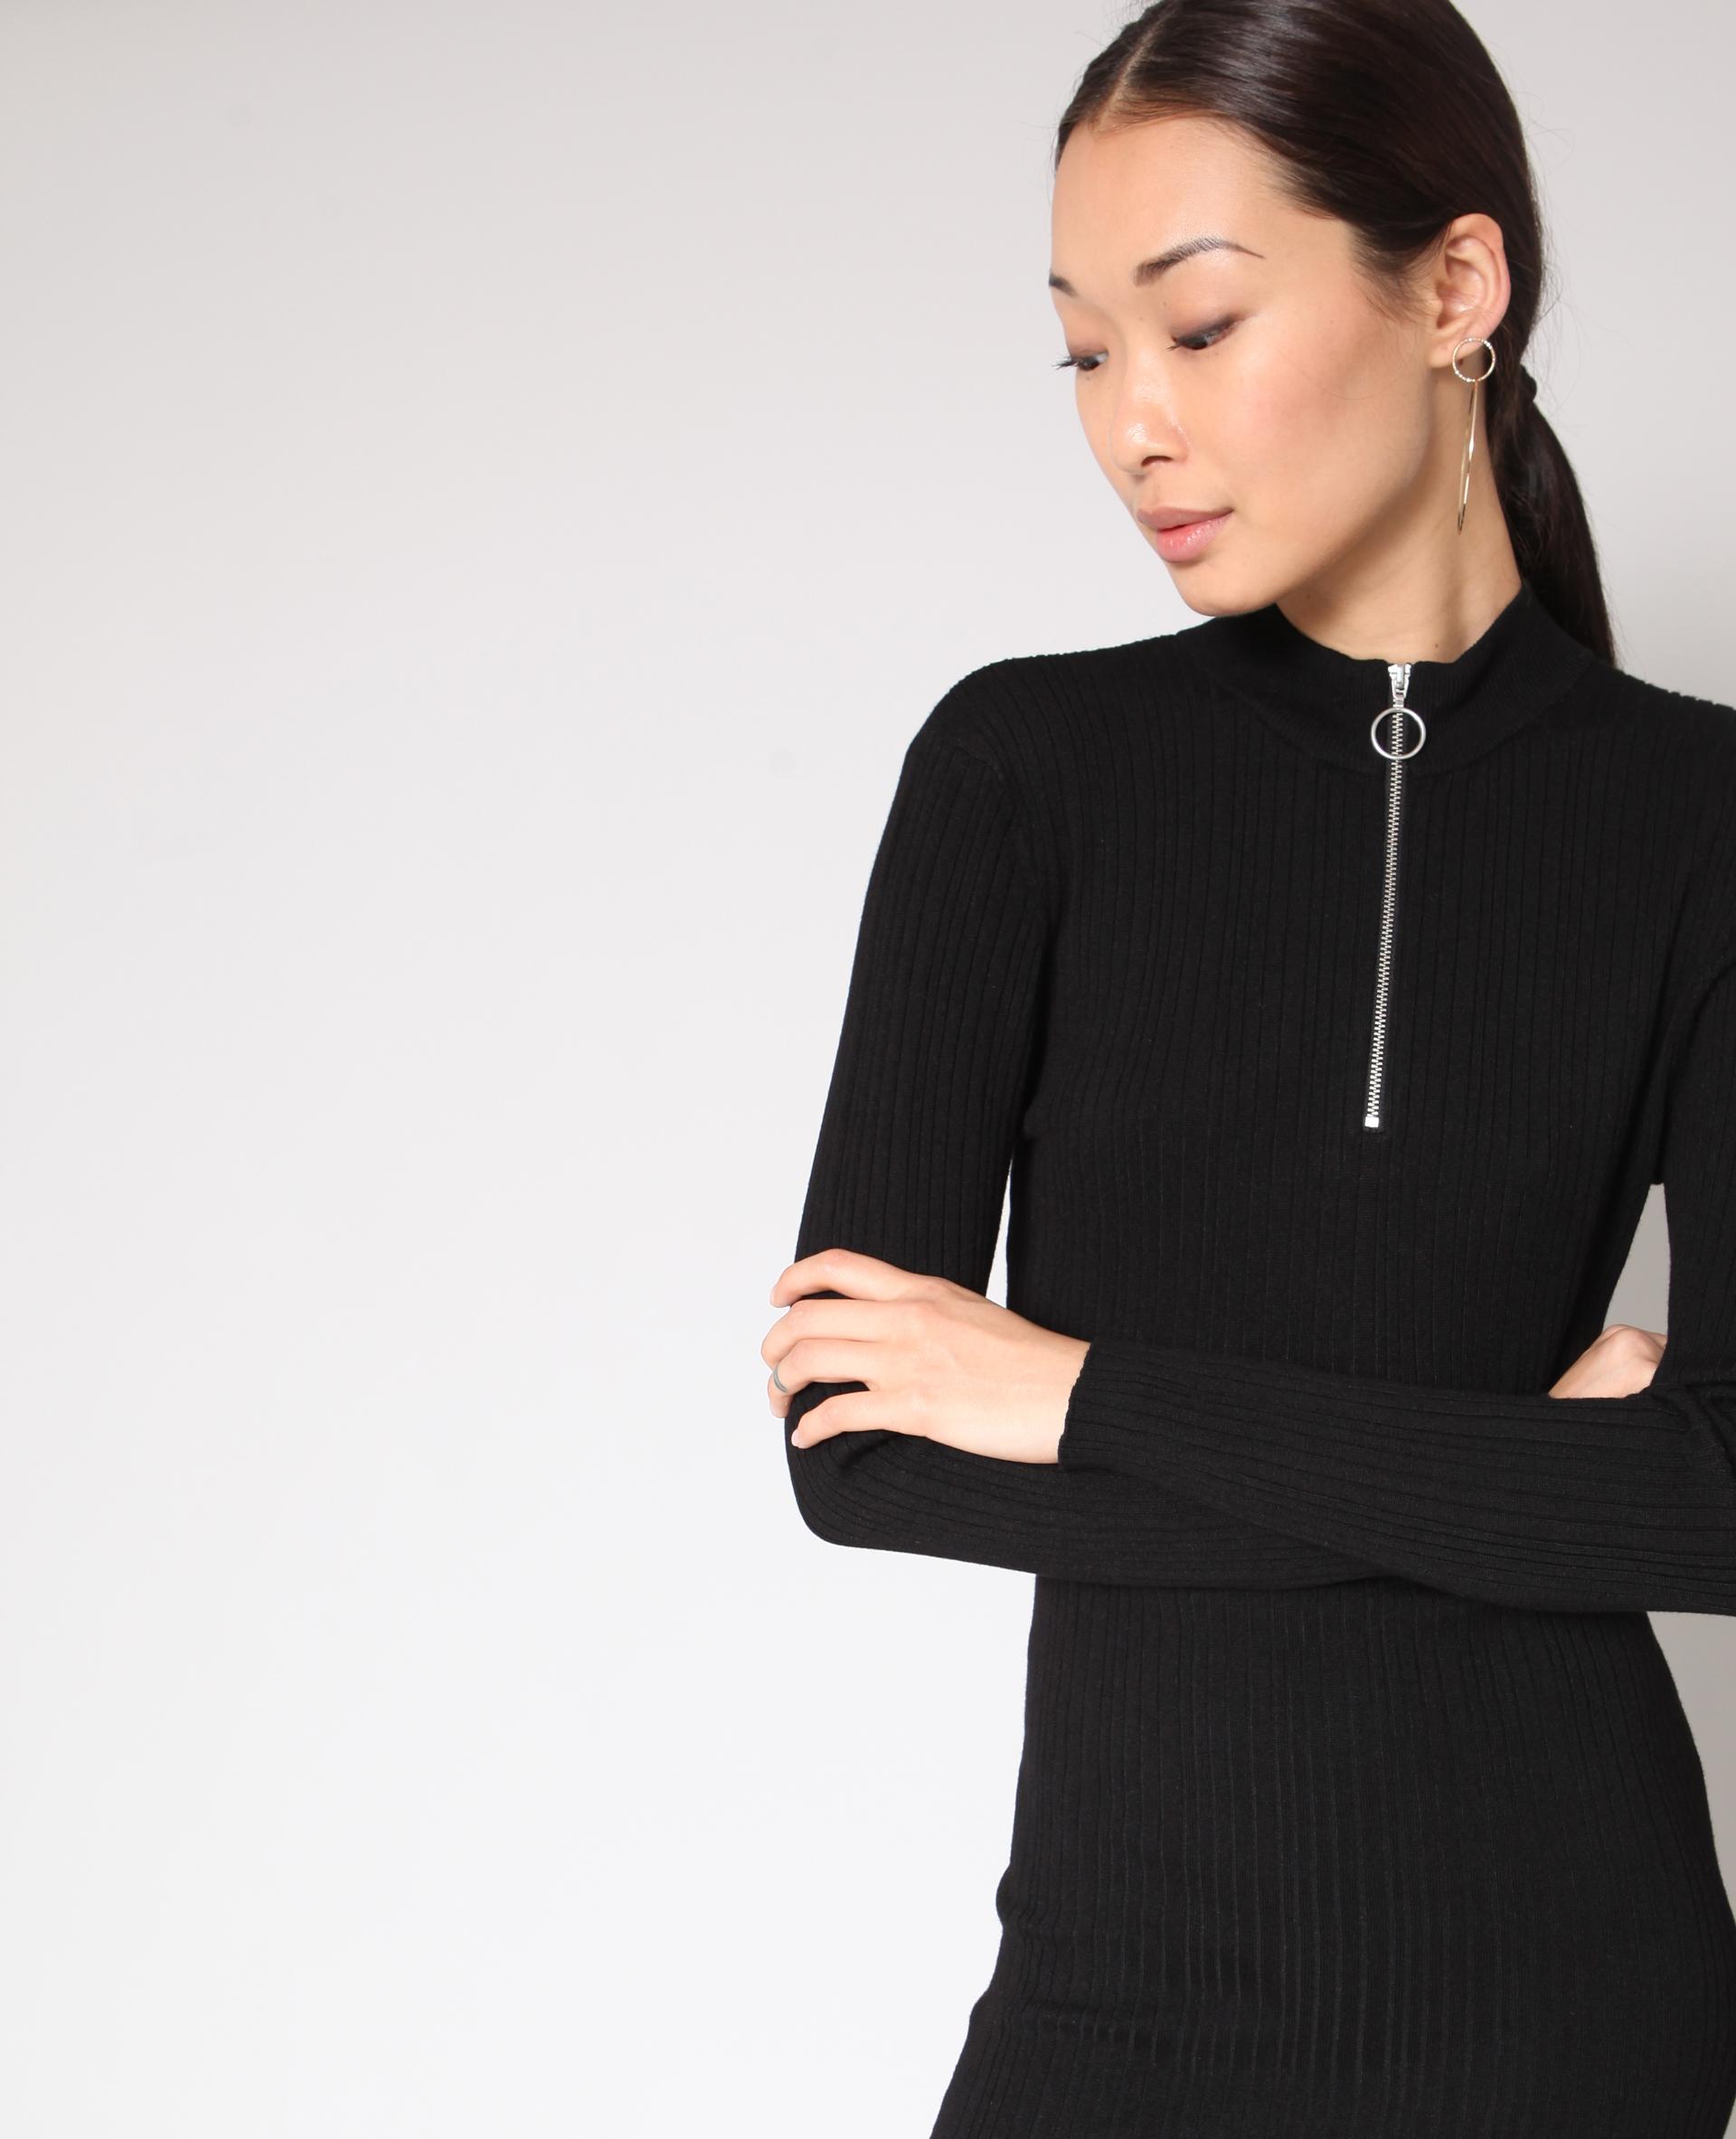 Verwonderlijk Lange strakke jurk zwart - 780914899A08   Pimkie JJ-35